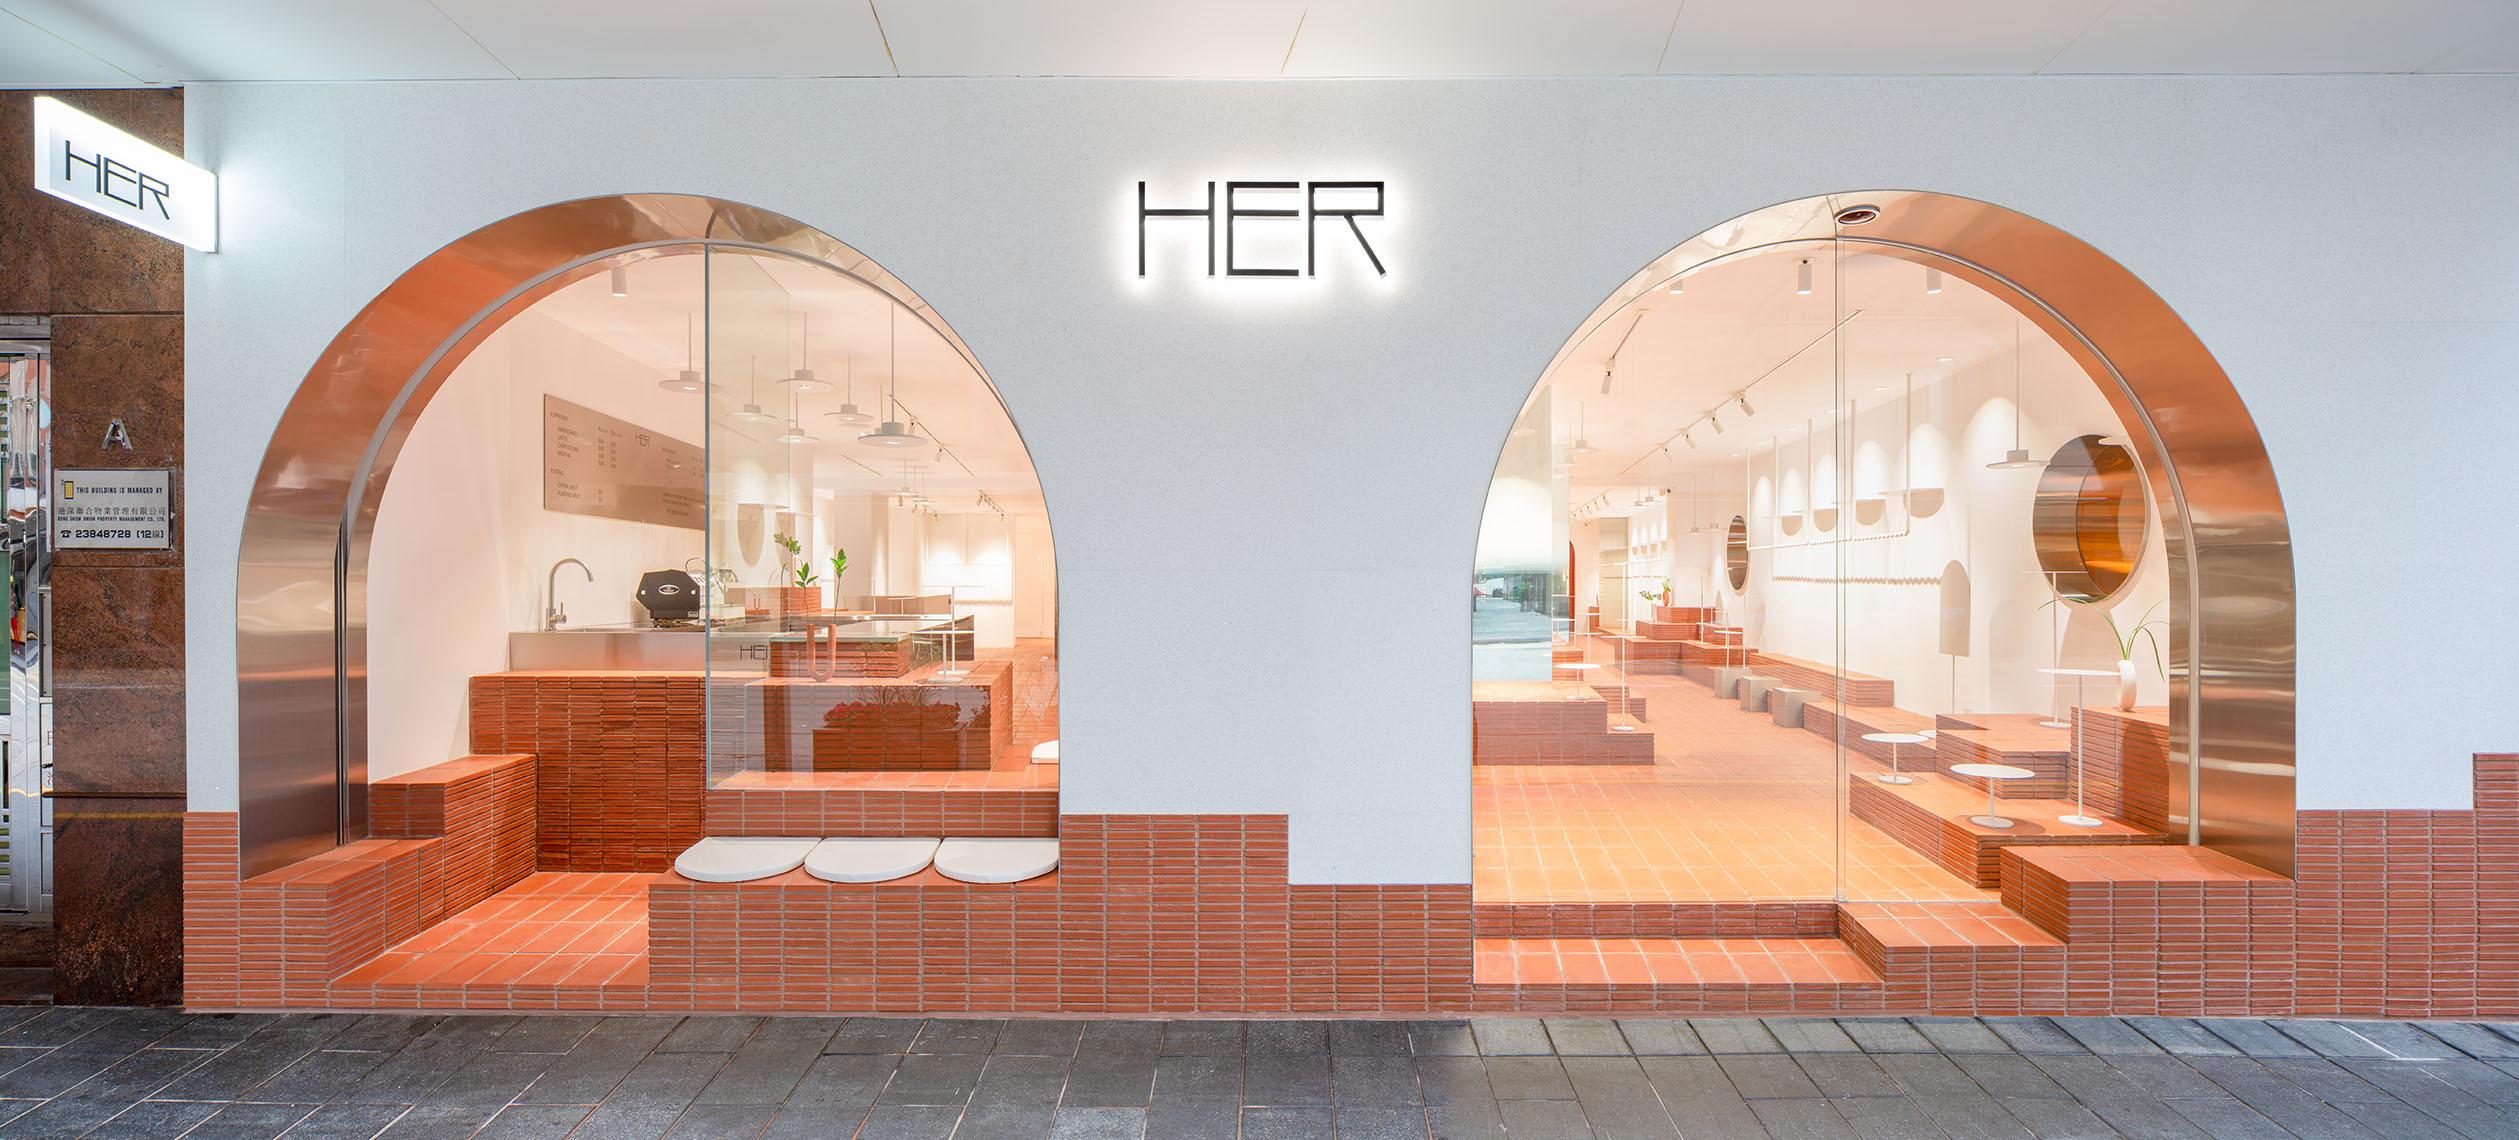 Clap-Studio-interior-design-retail-HER-Hilary-Tsui-hong-kong-design